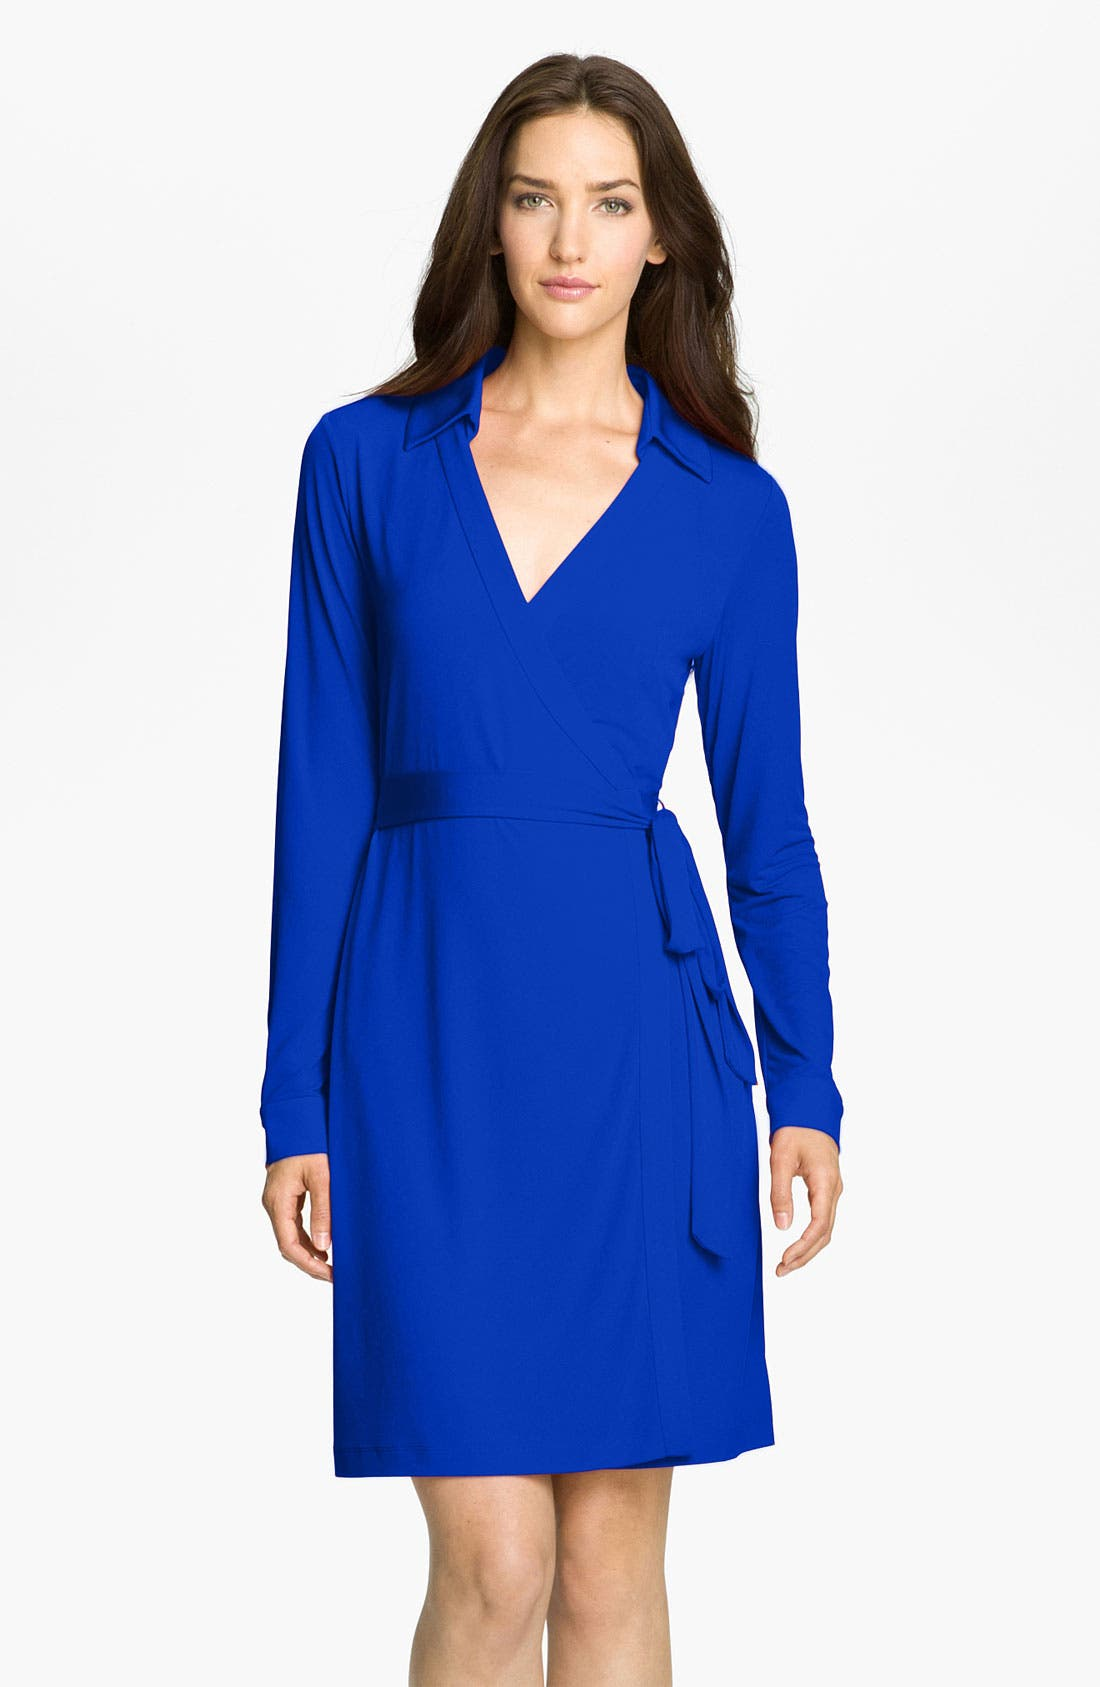 Main Image - Calvin Klein Collared Jersey Wrap Dress (Petite)